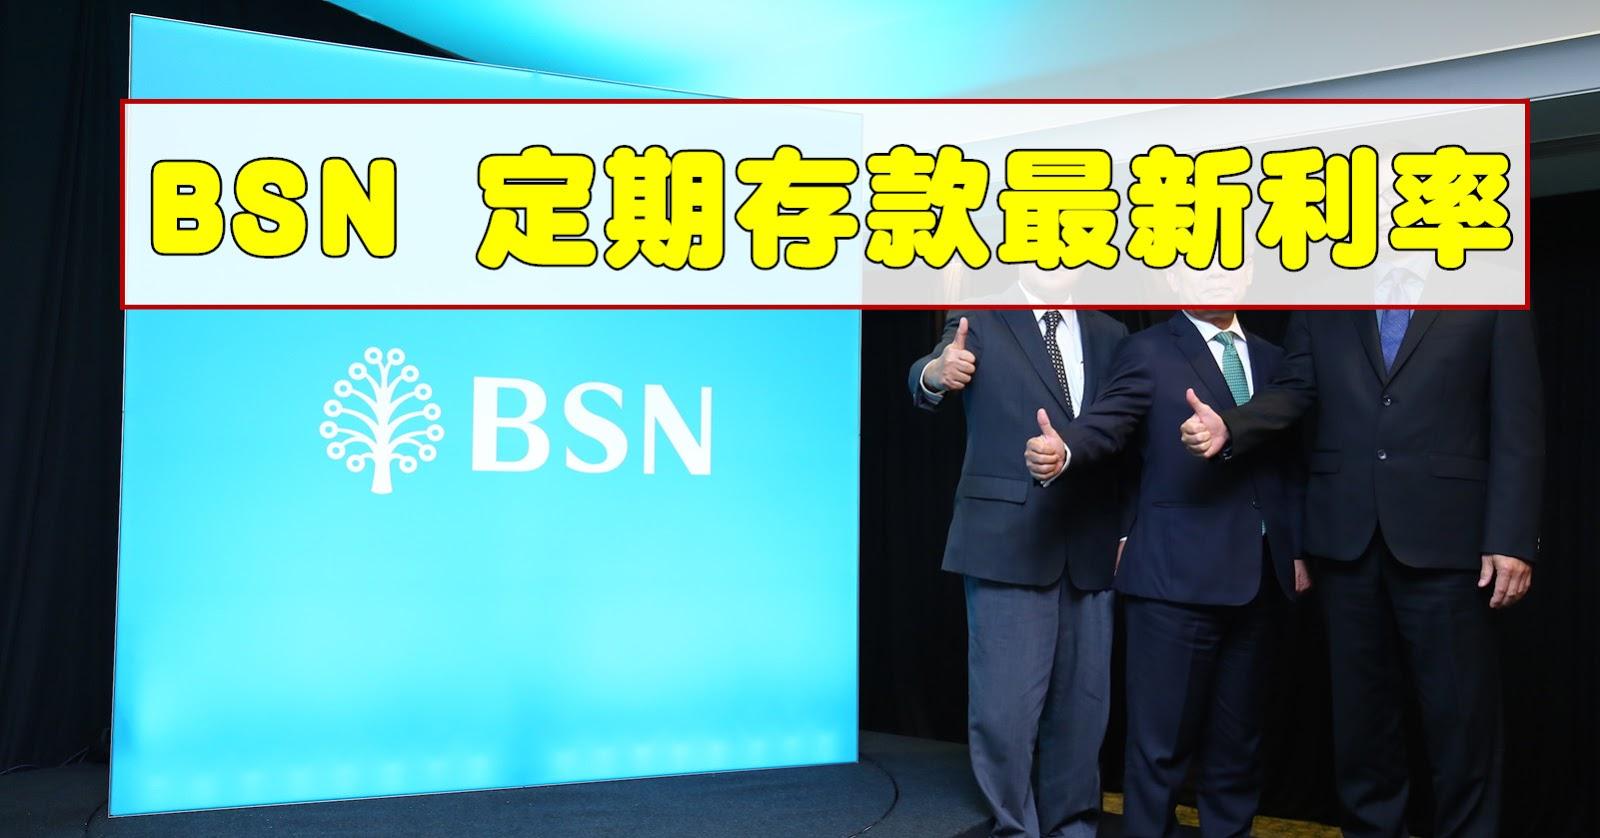 BSN 定期存款最新利率